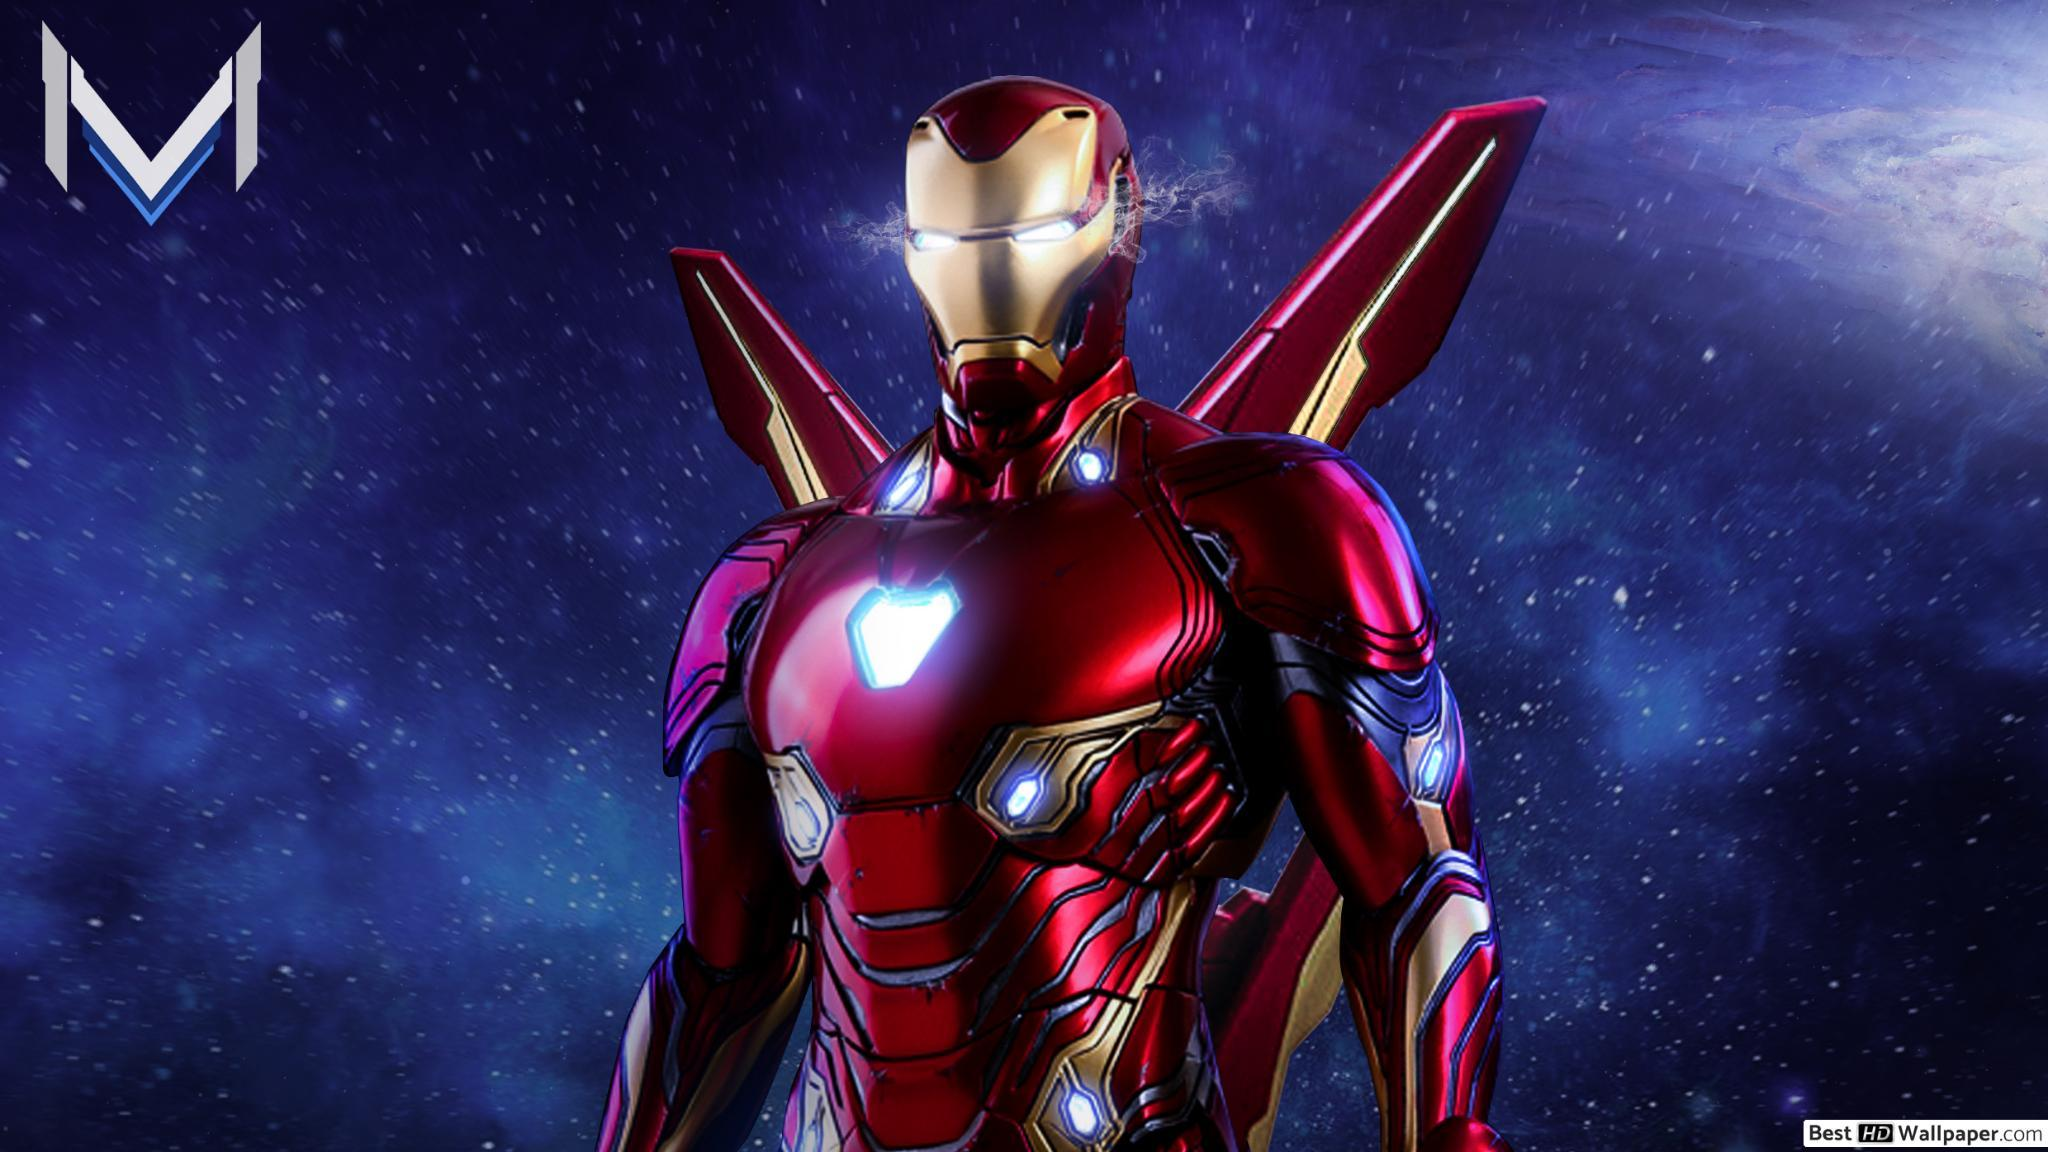 Download Avengers Endgame Iron Man HD Wallpaper Download